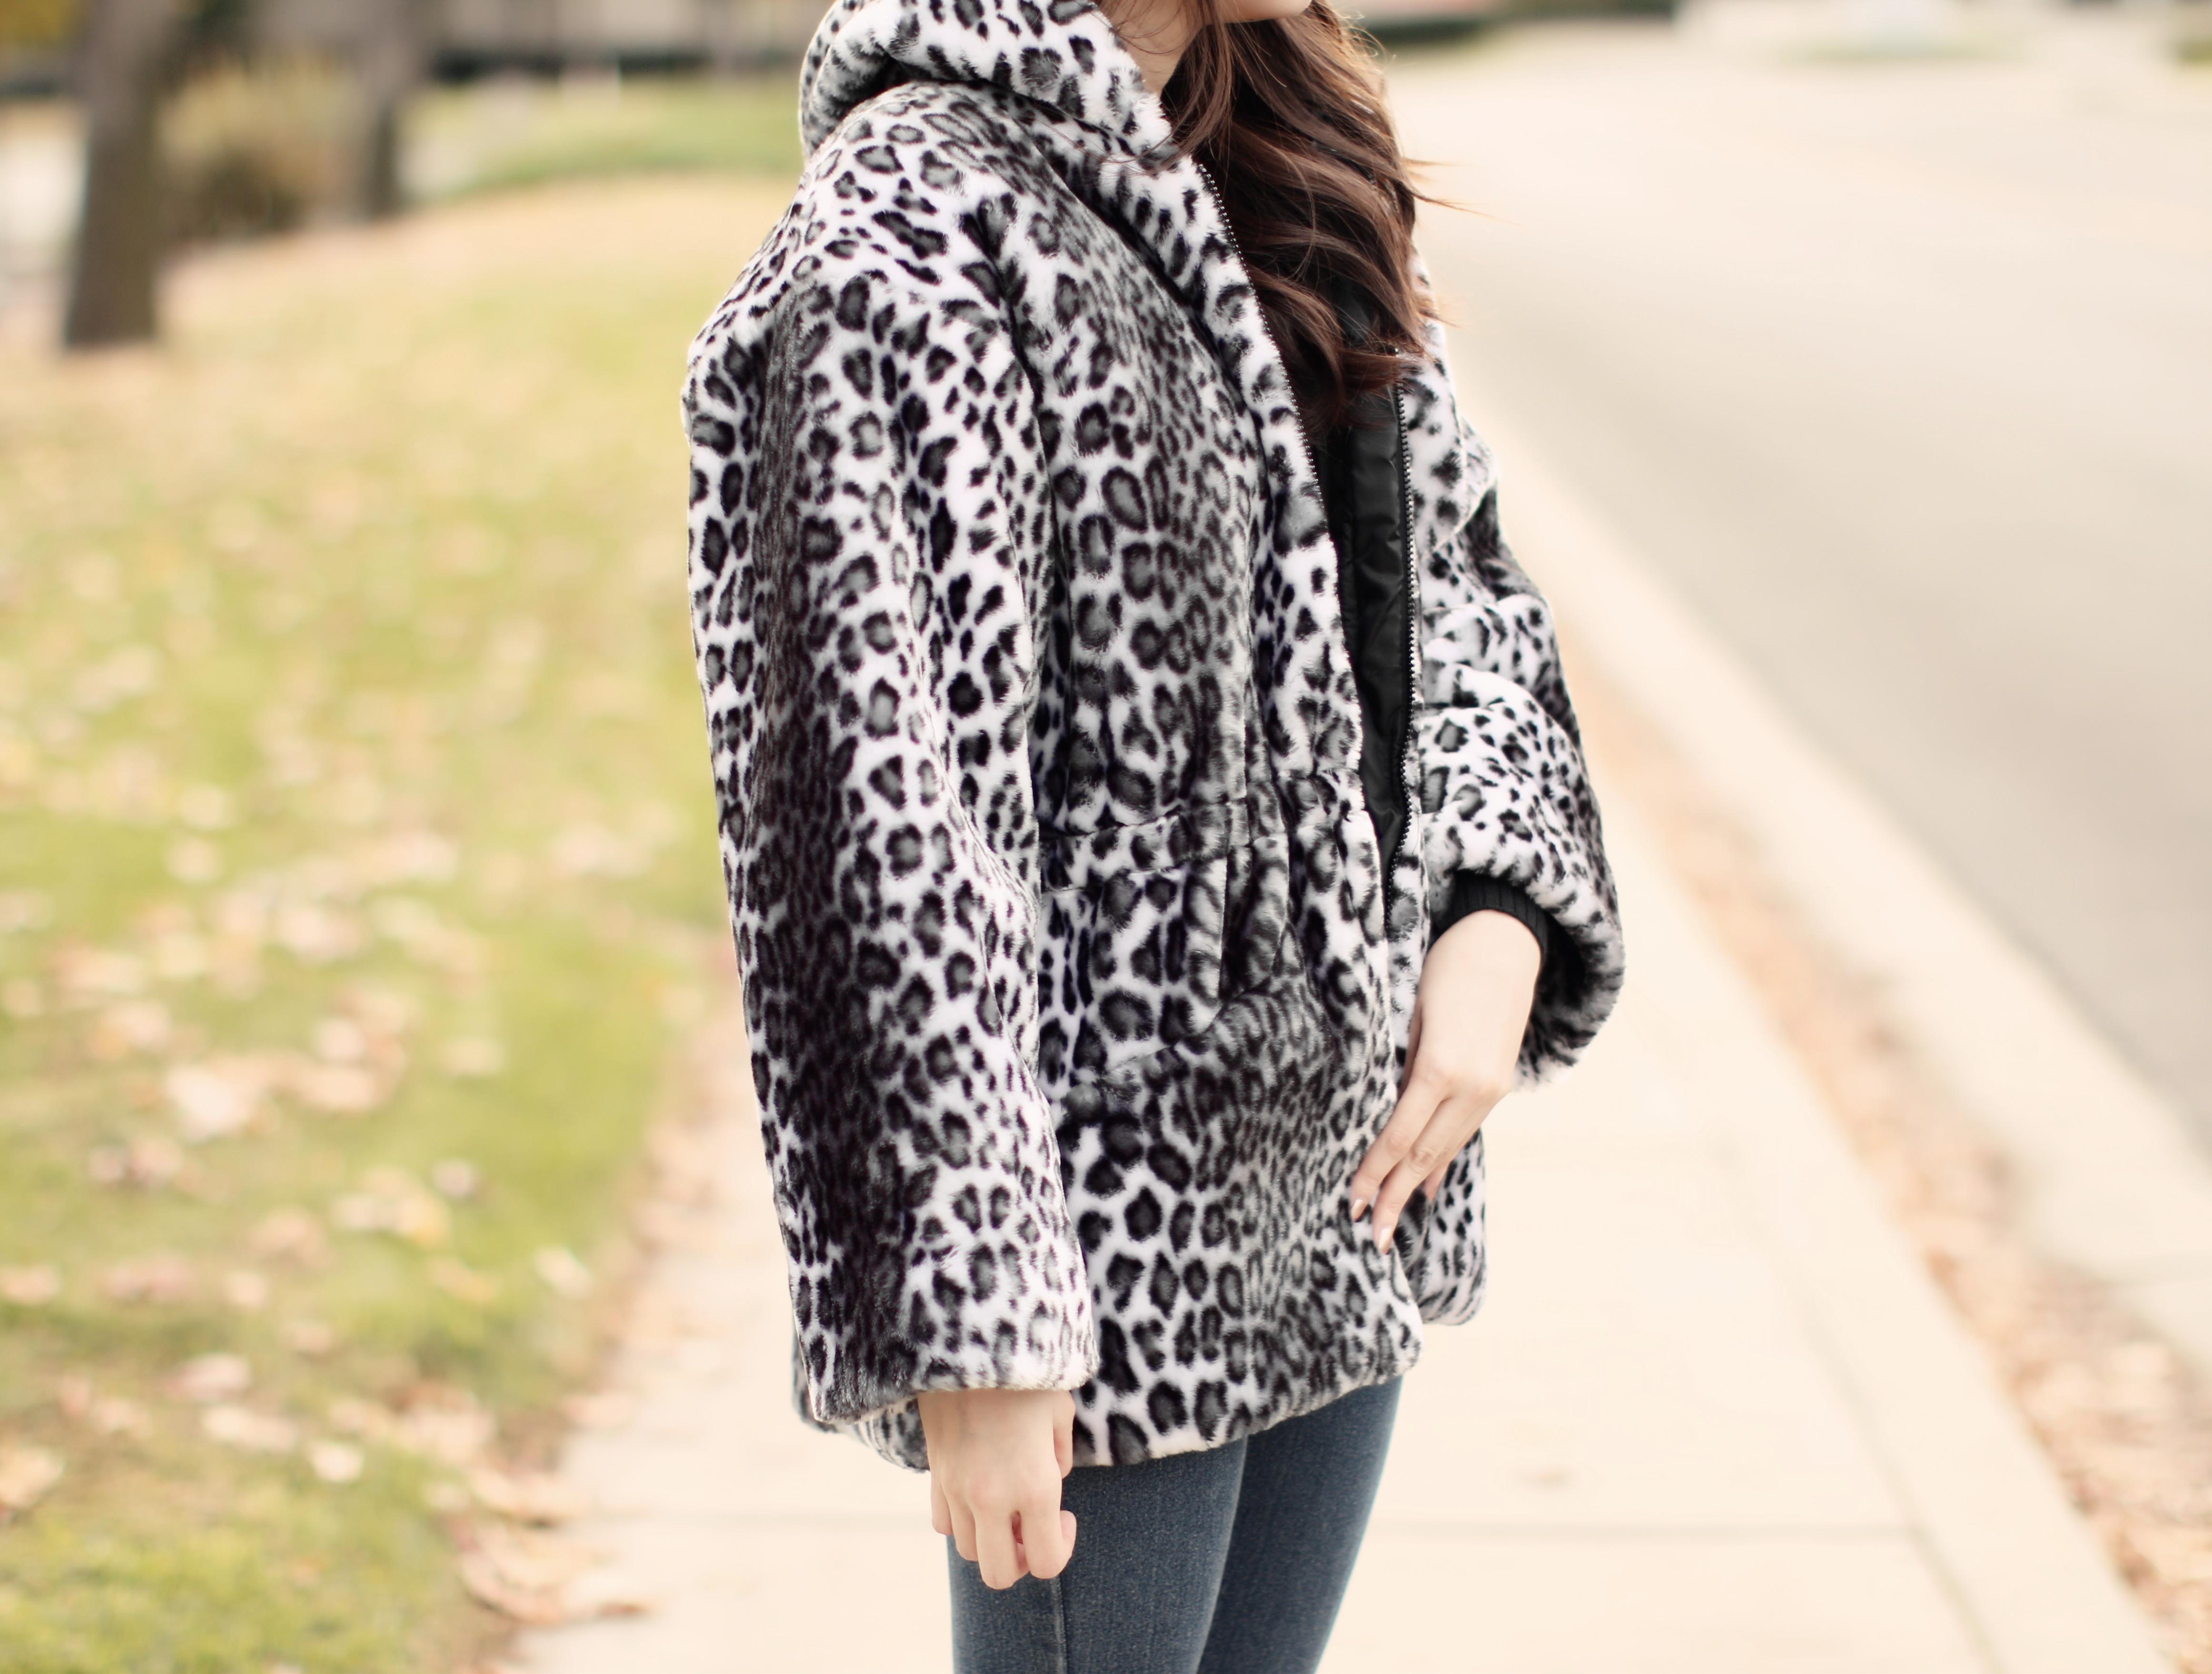 4070-ootd-fashion-style-outfitoftheday-wiwt-streetstyle-furcoat-fauxfur-forever21-f21xme-hollister-hcostylescene-elizabeeetht-clothestoyouuu